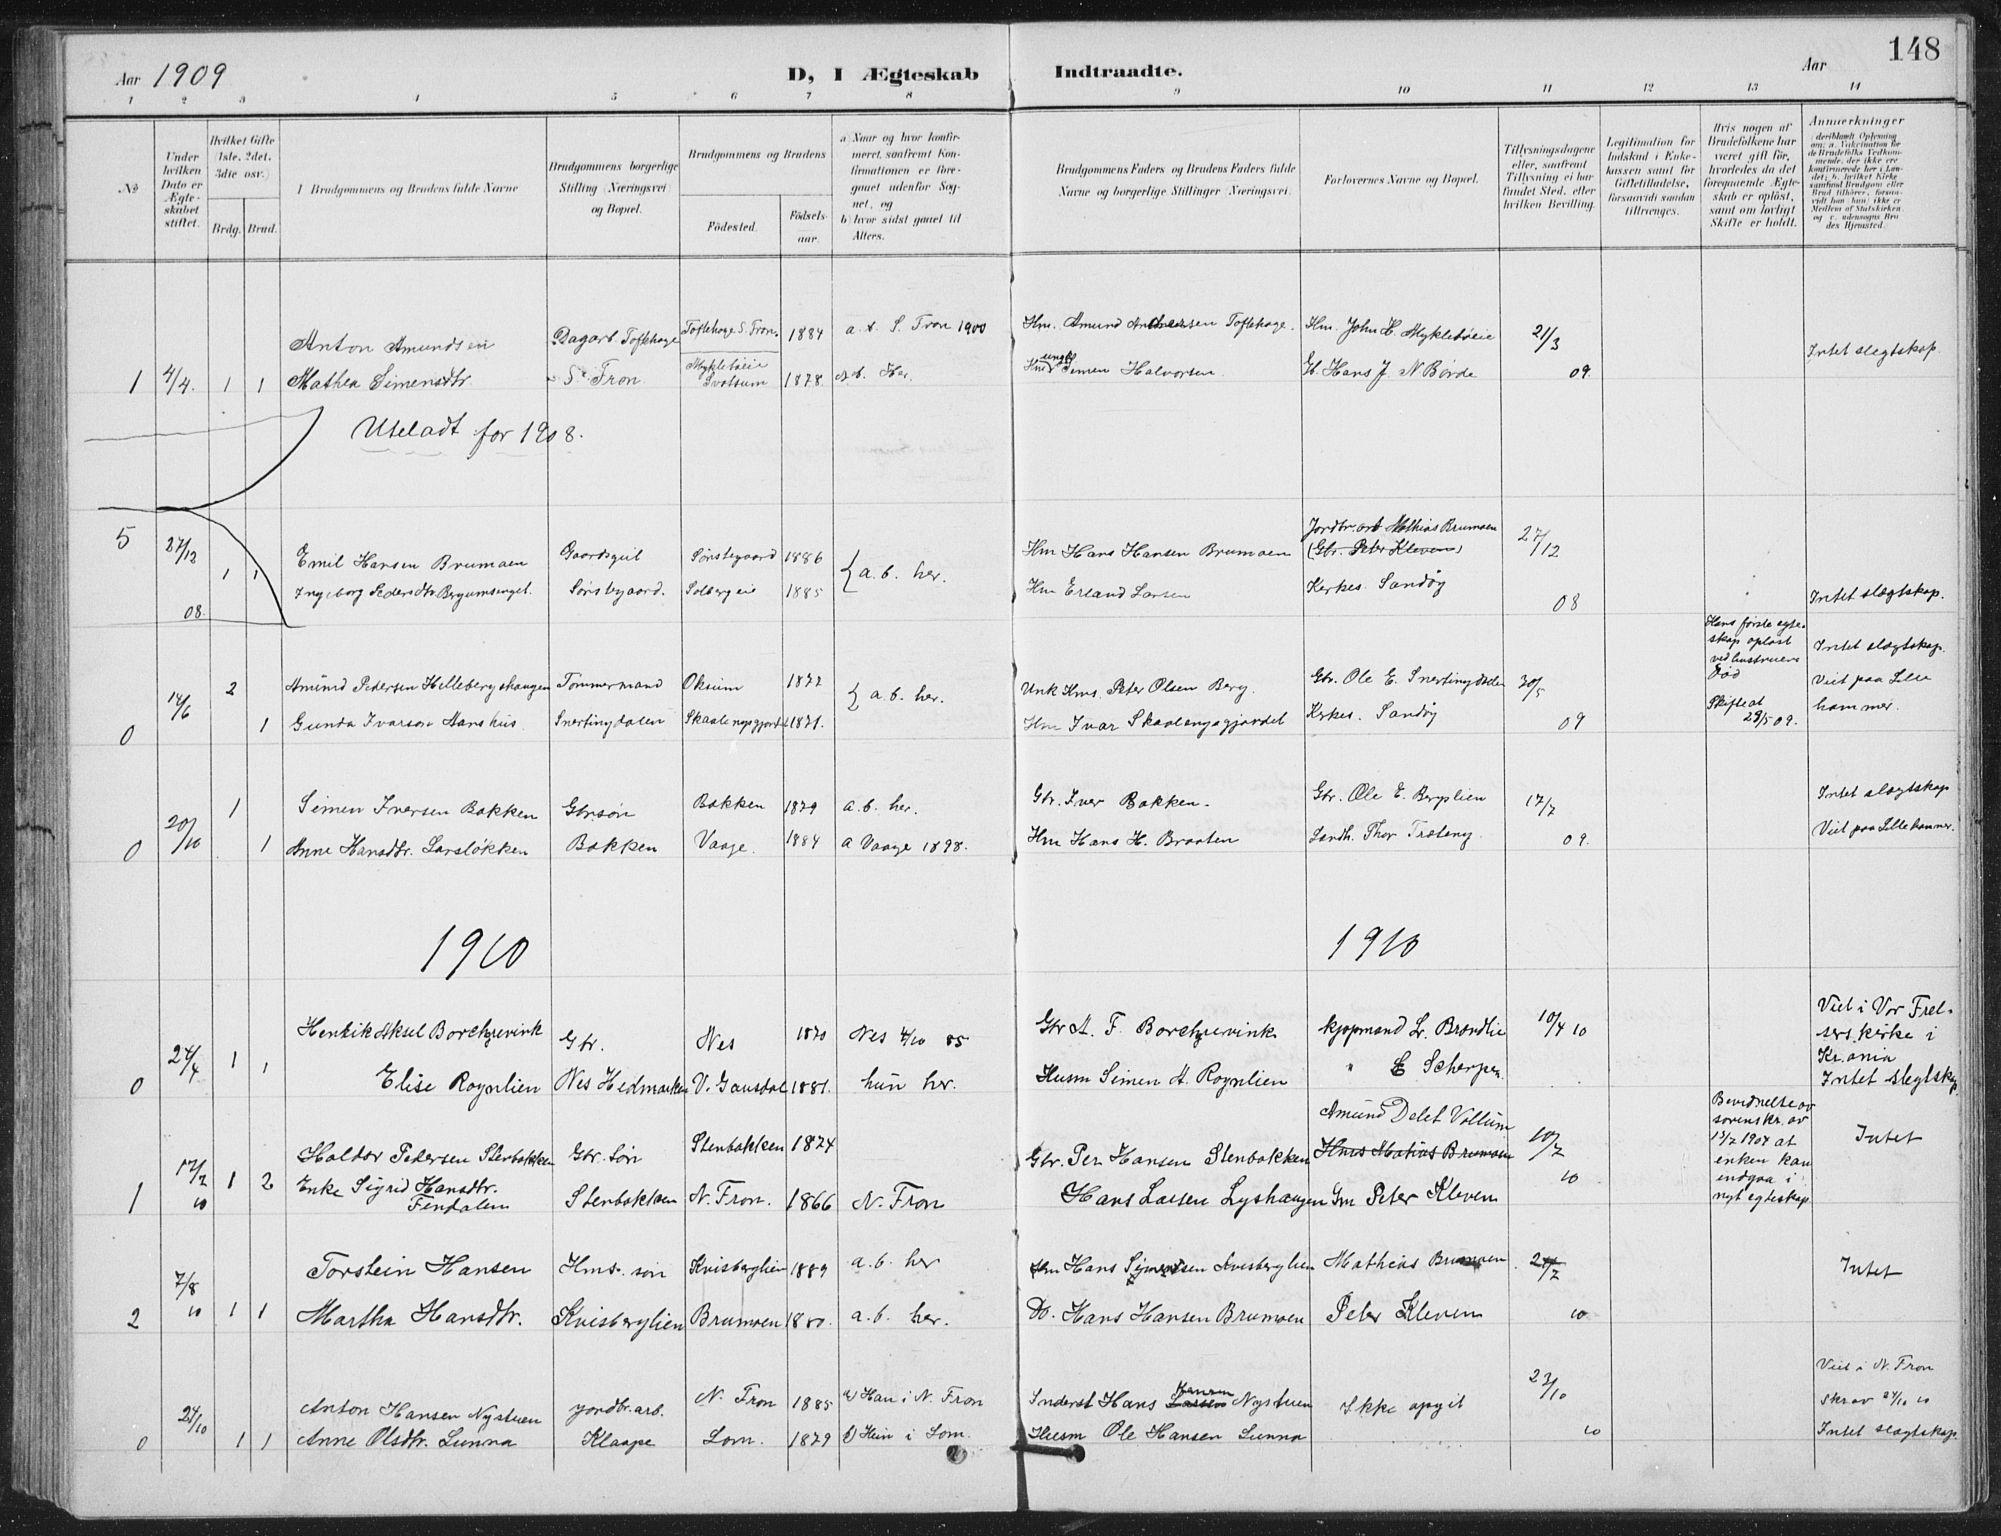 SAH, Vestre Gausdal prestekontor, Klokkerbok nr. 4, 1898-1939, s. 148